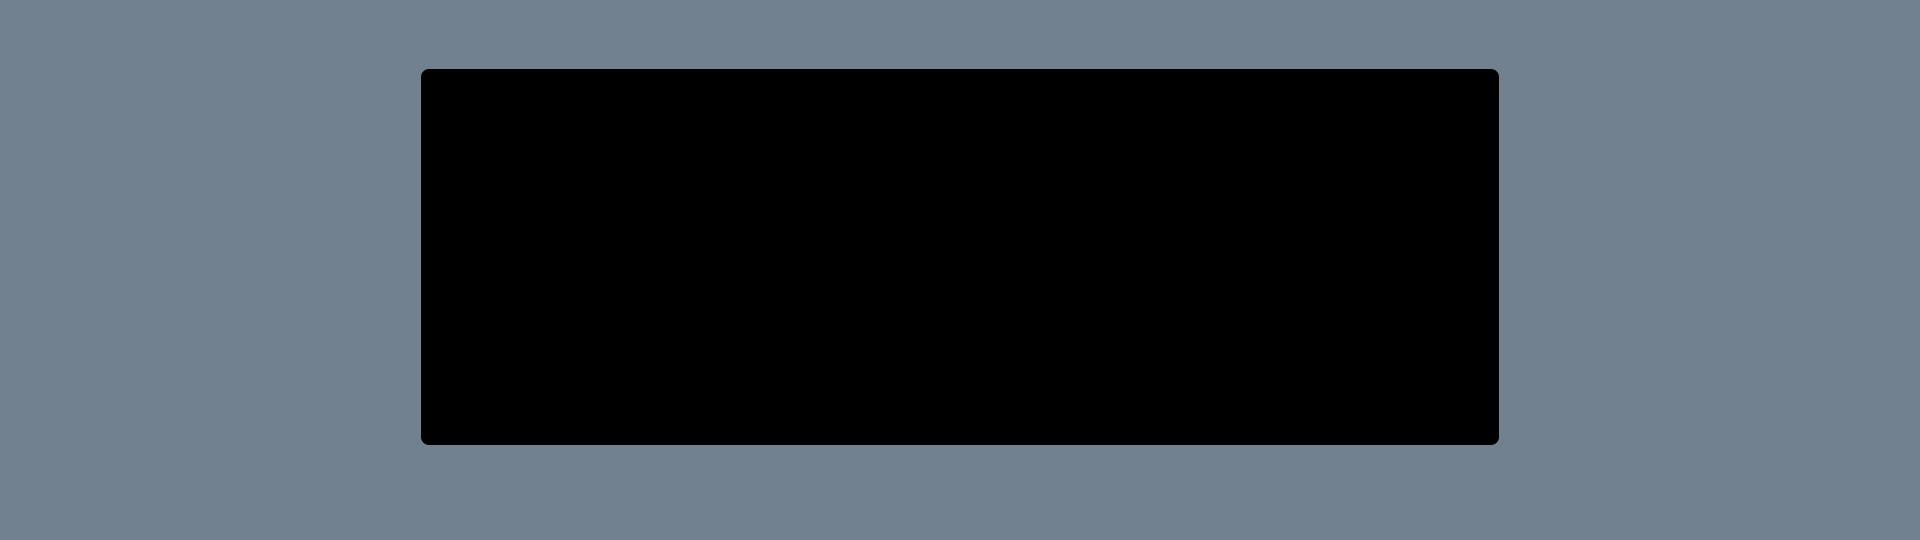 CATEGORY-BILG-SECILIBILGVEAKSESUARSEPETTE20-28-01